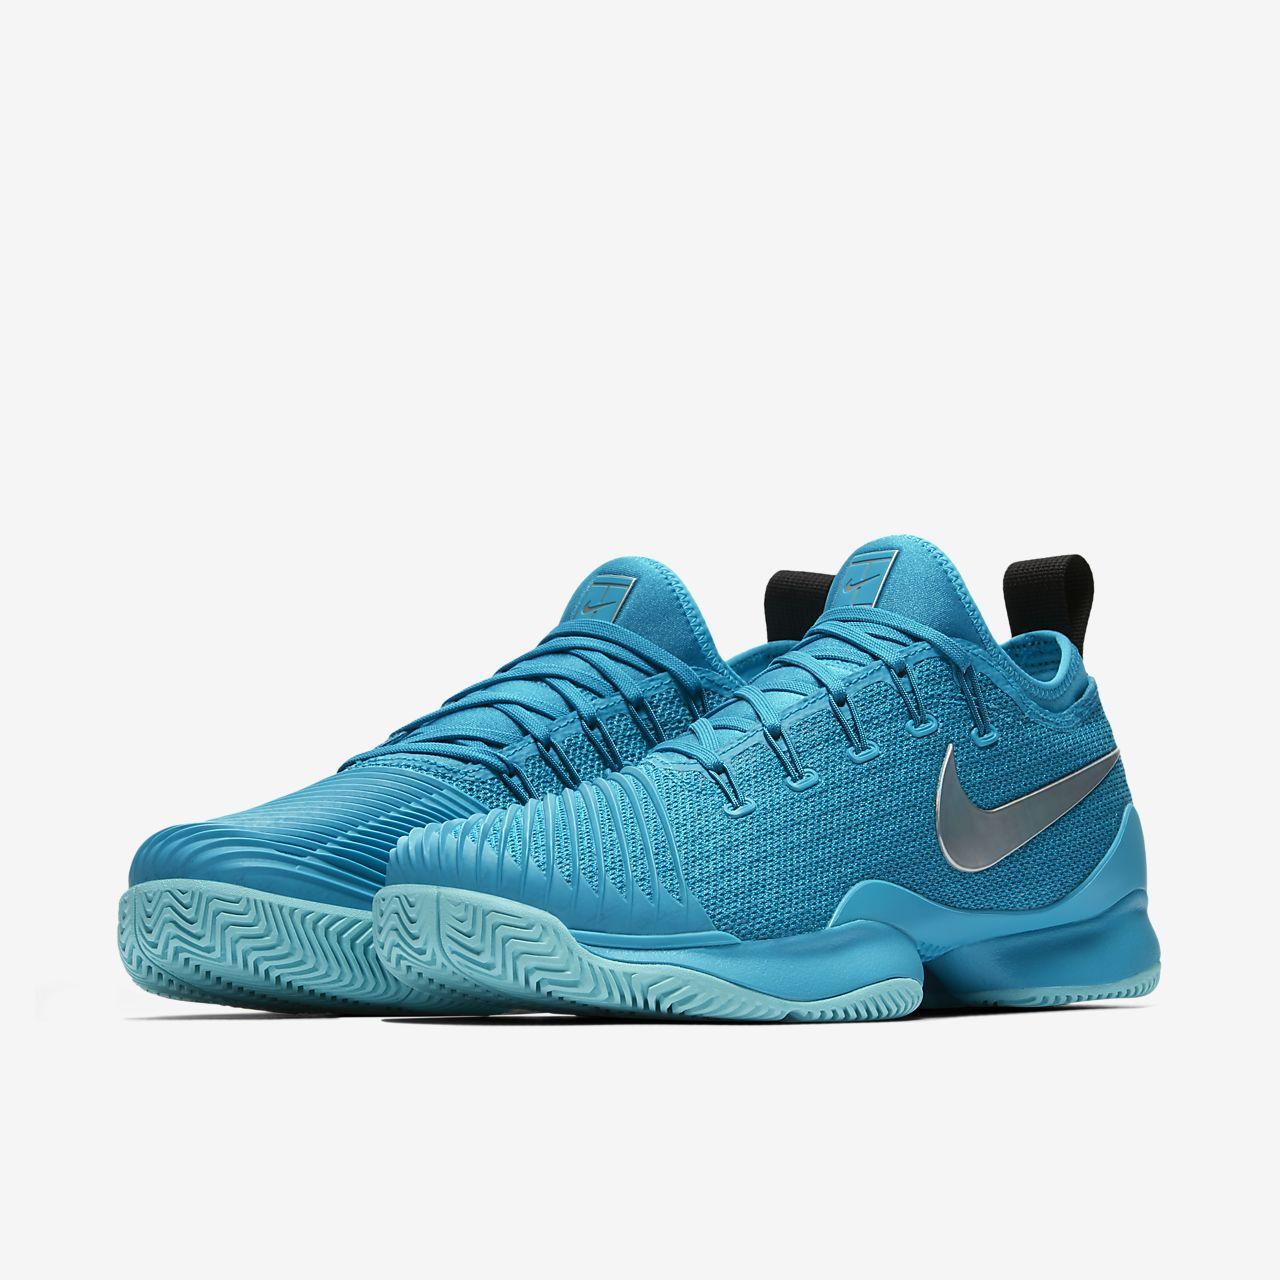 Nikecourt Air Femme De Hc Pour Zoom React Ultra Tennis Chaussure BqUx1wZwv